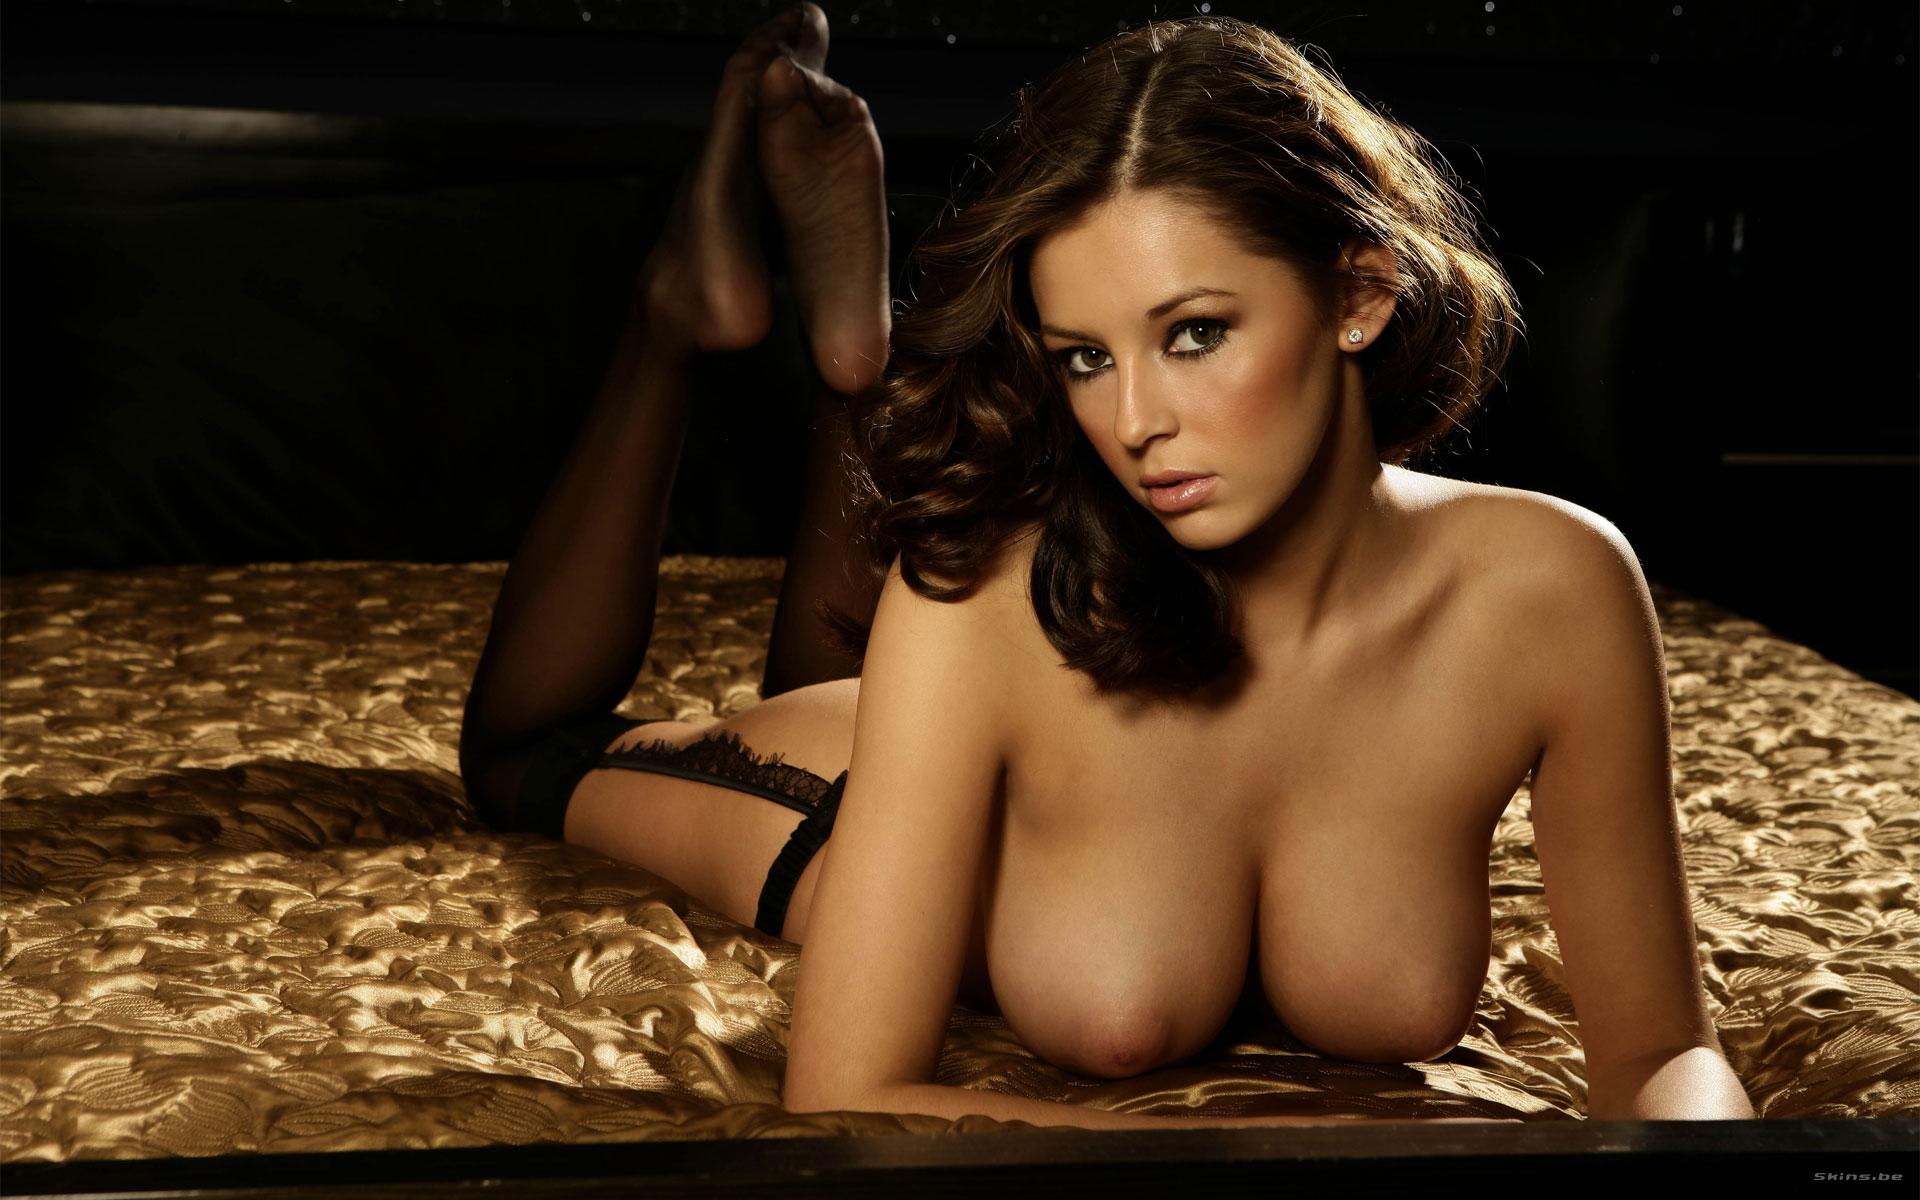 devushki-seksualnie-fotografii